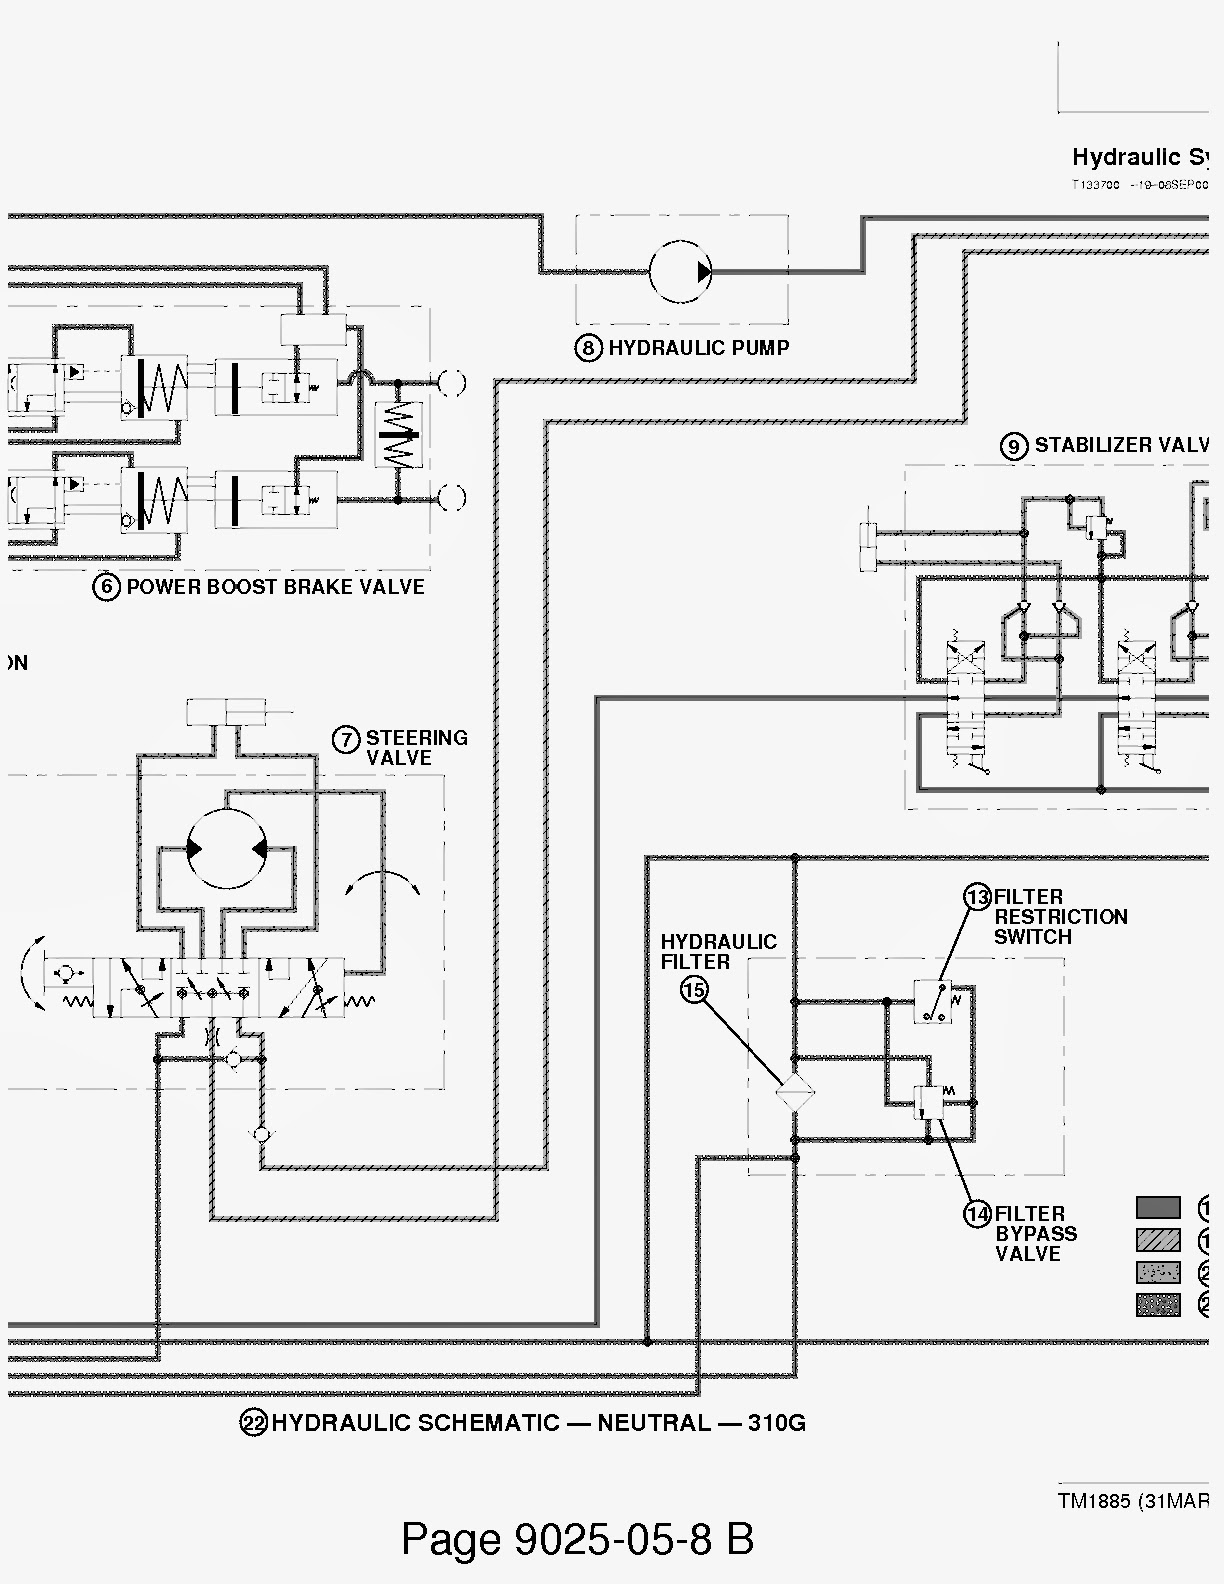 small resolution of wrg 9829 310g john deere wiring diagram310g john deere wiring diagram